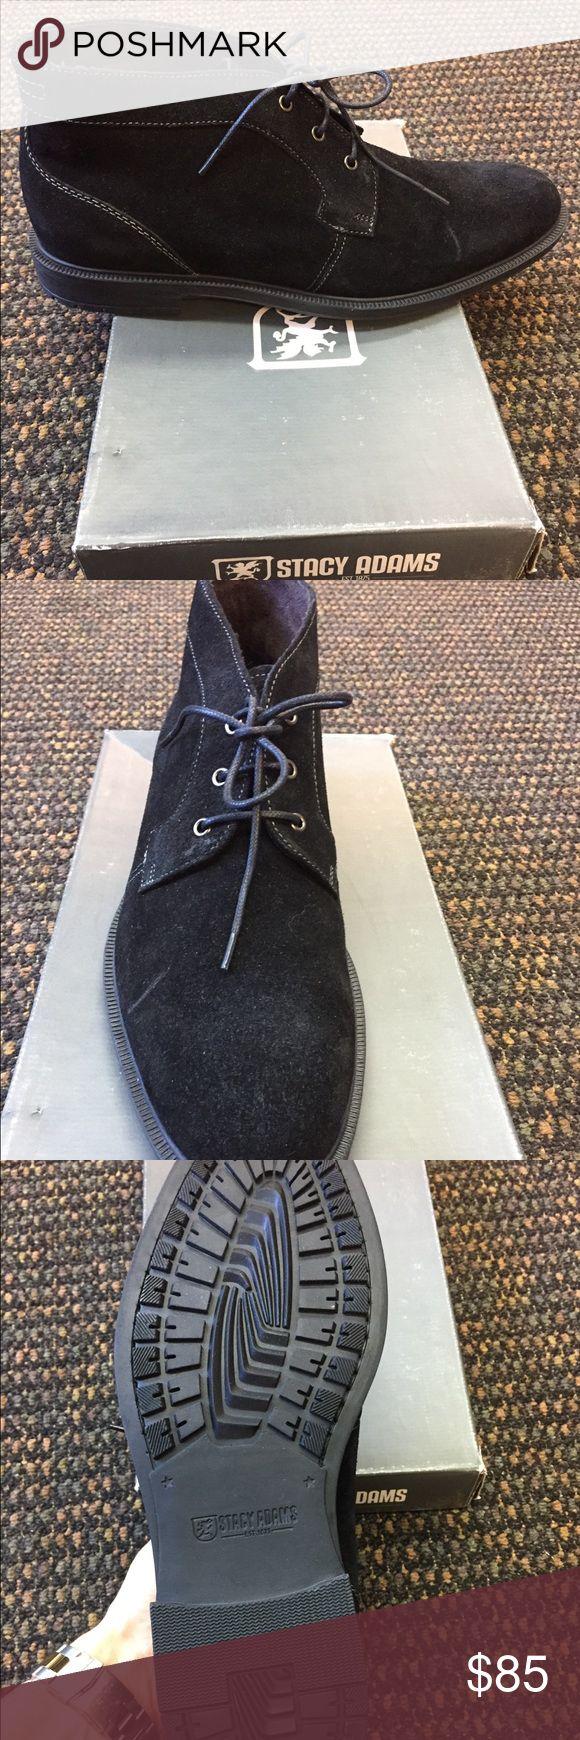 Stacy Adams Dabney Black Suede Chukka Boot - NWT Stacy Adams Dabney Black Suede Chukka Boot - NWT Stacy Adams Shoes Chukka Boots